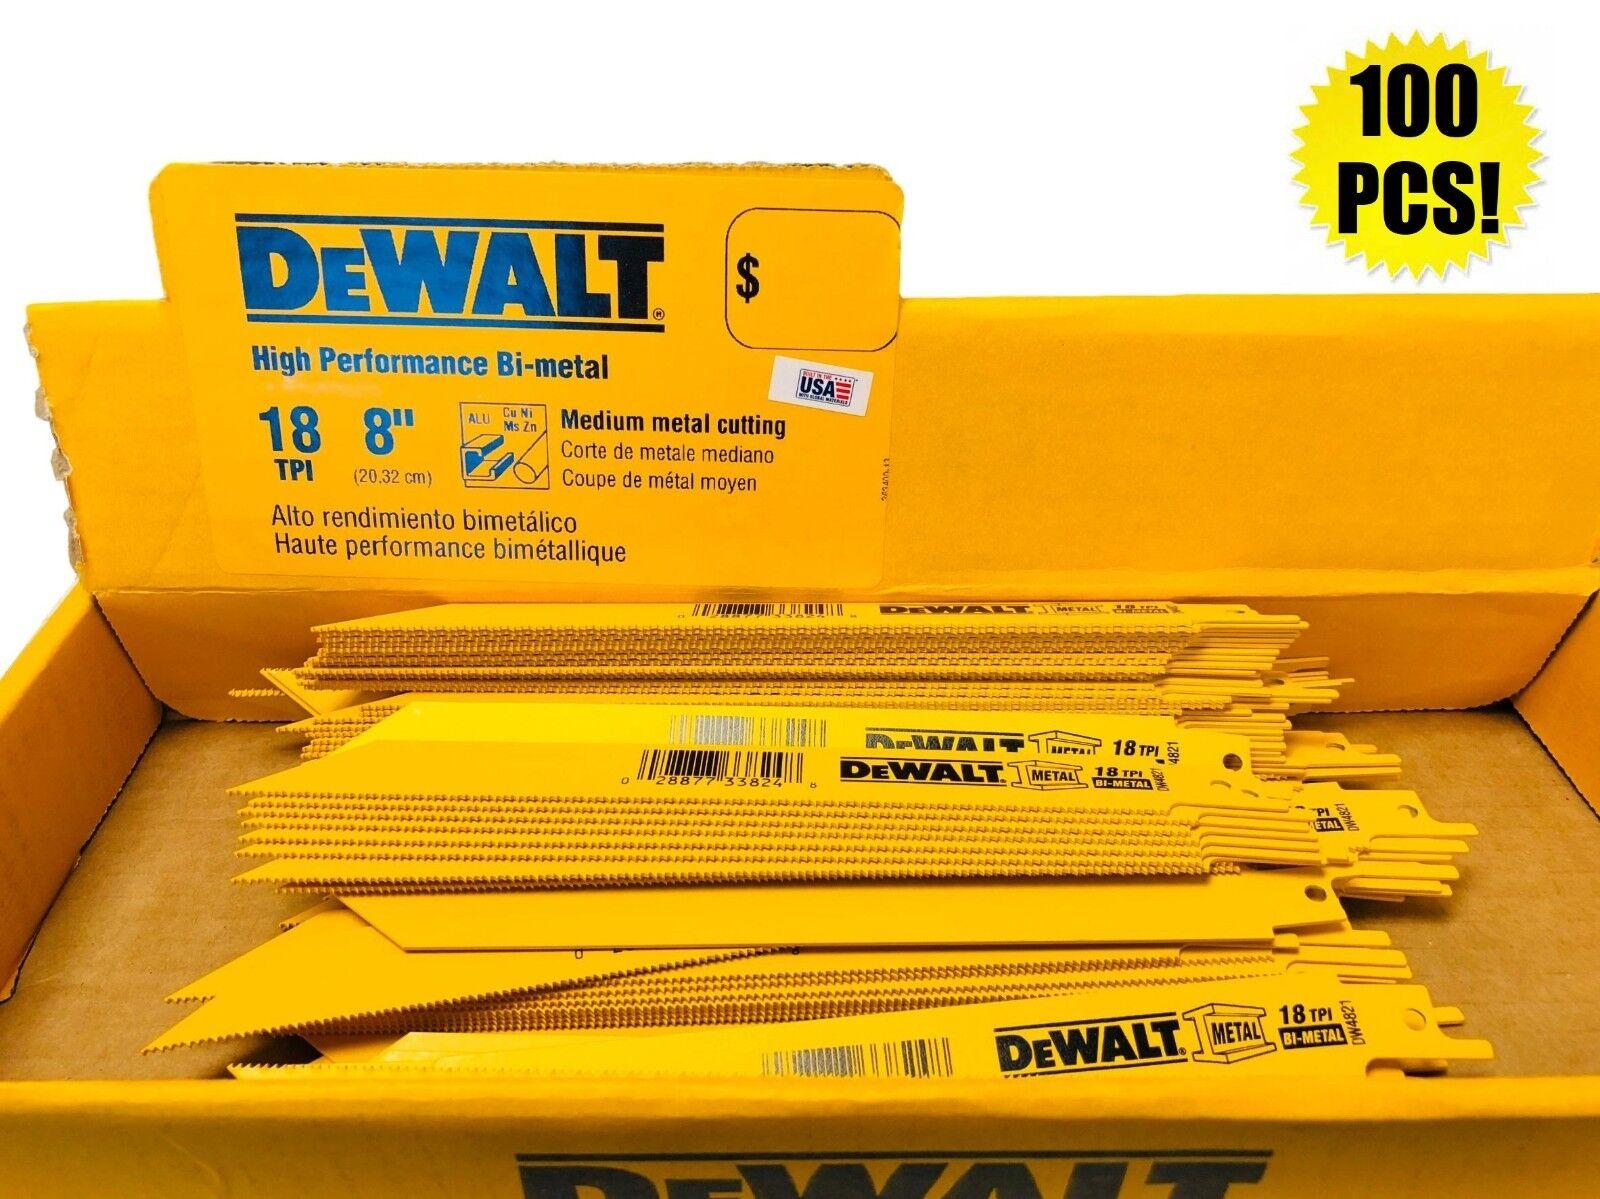 (100) DEWALT 8